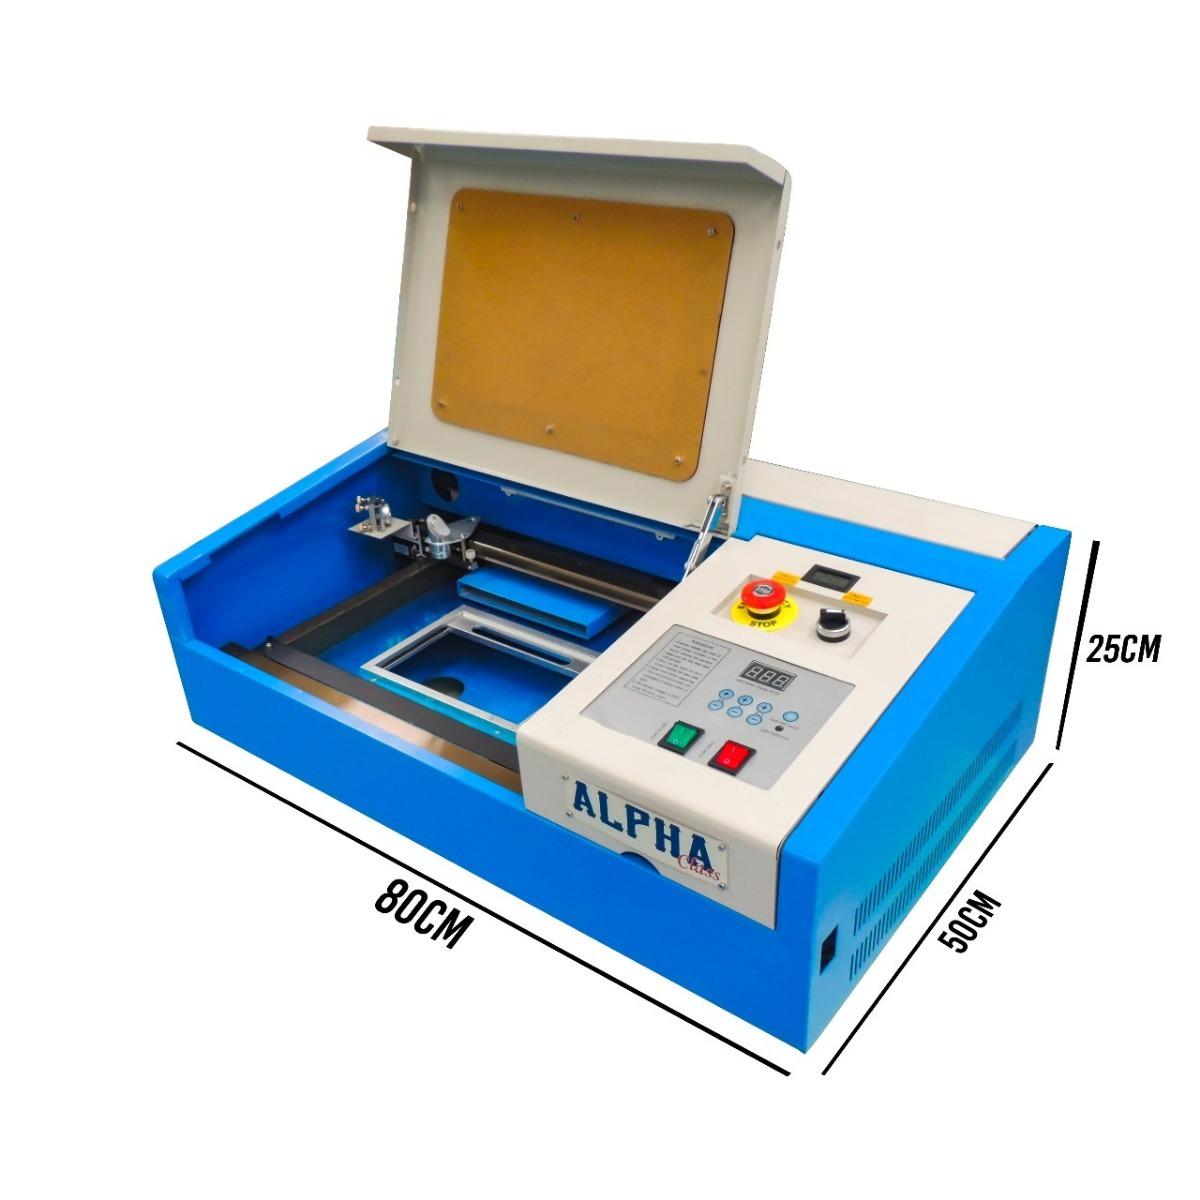 07fa4eecd mini máquina corte e gravacao a laser 30x20 cm carimbos. Carregando zoom.